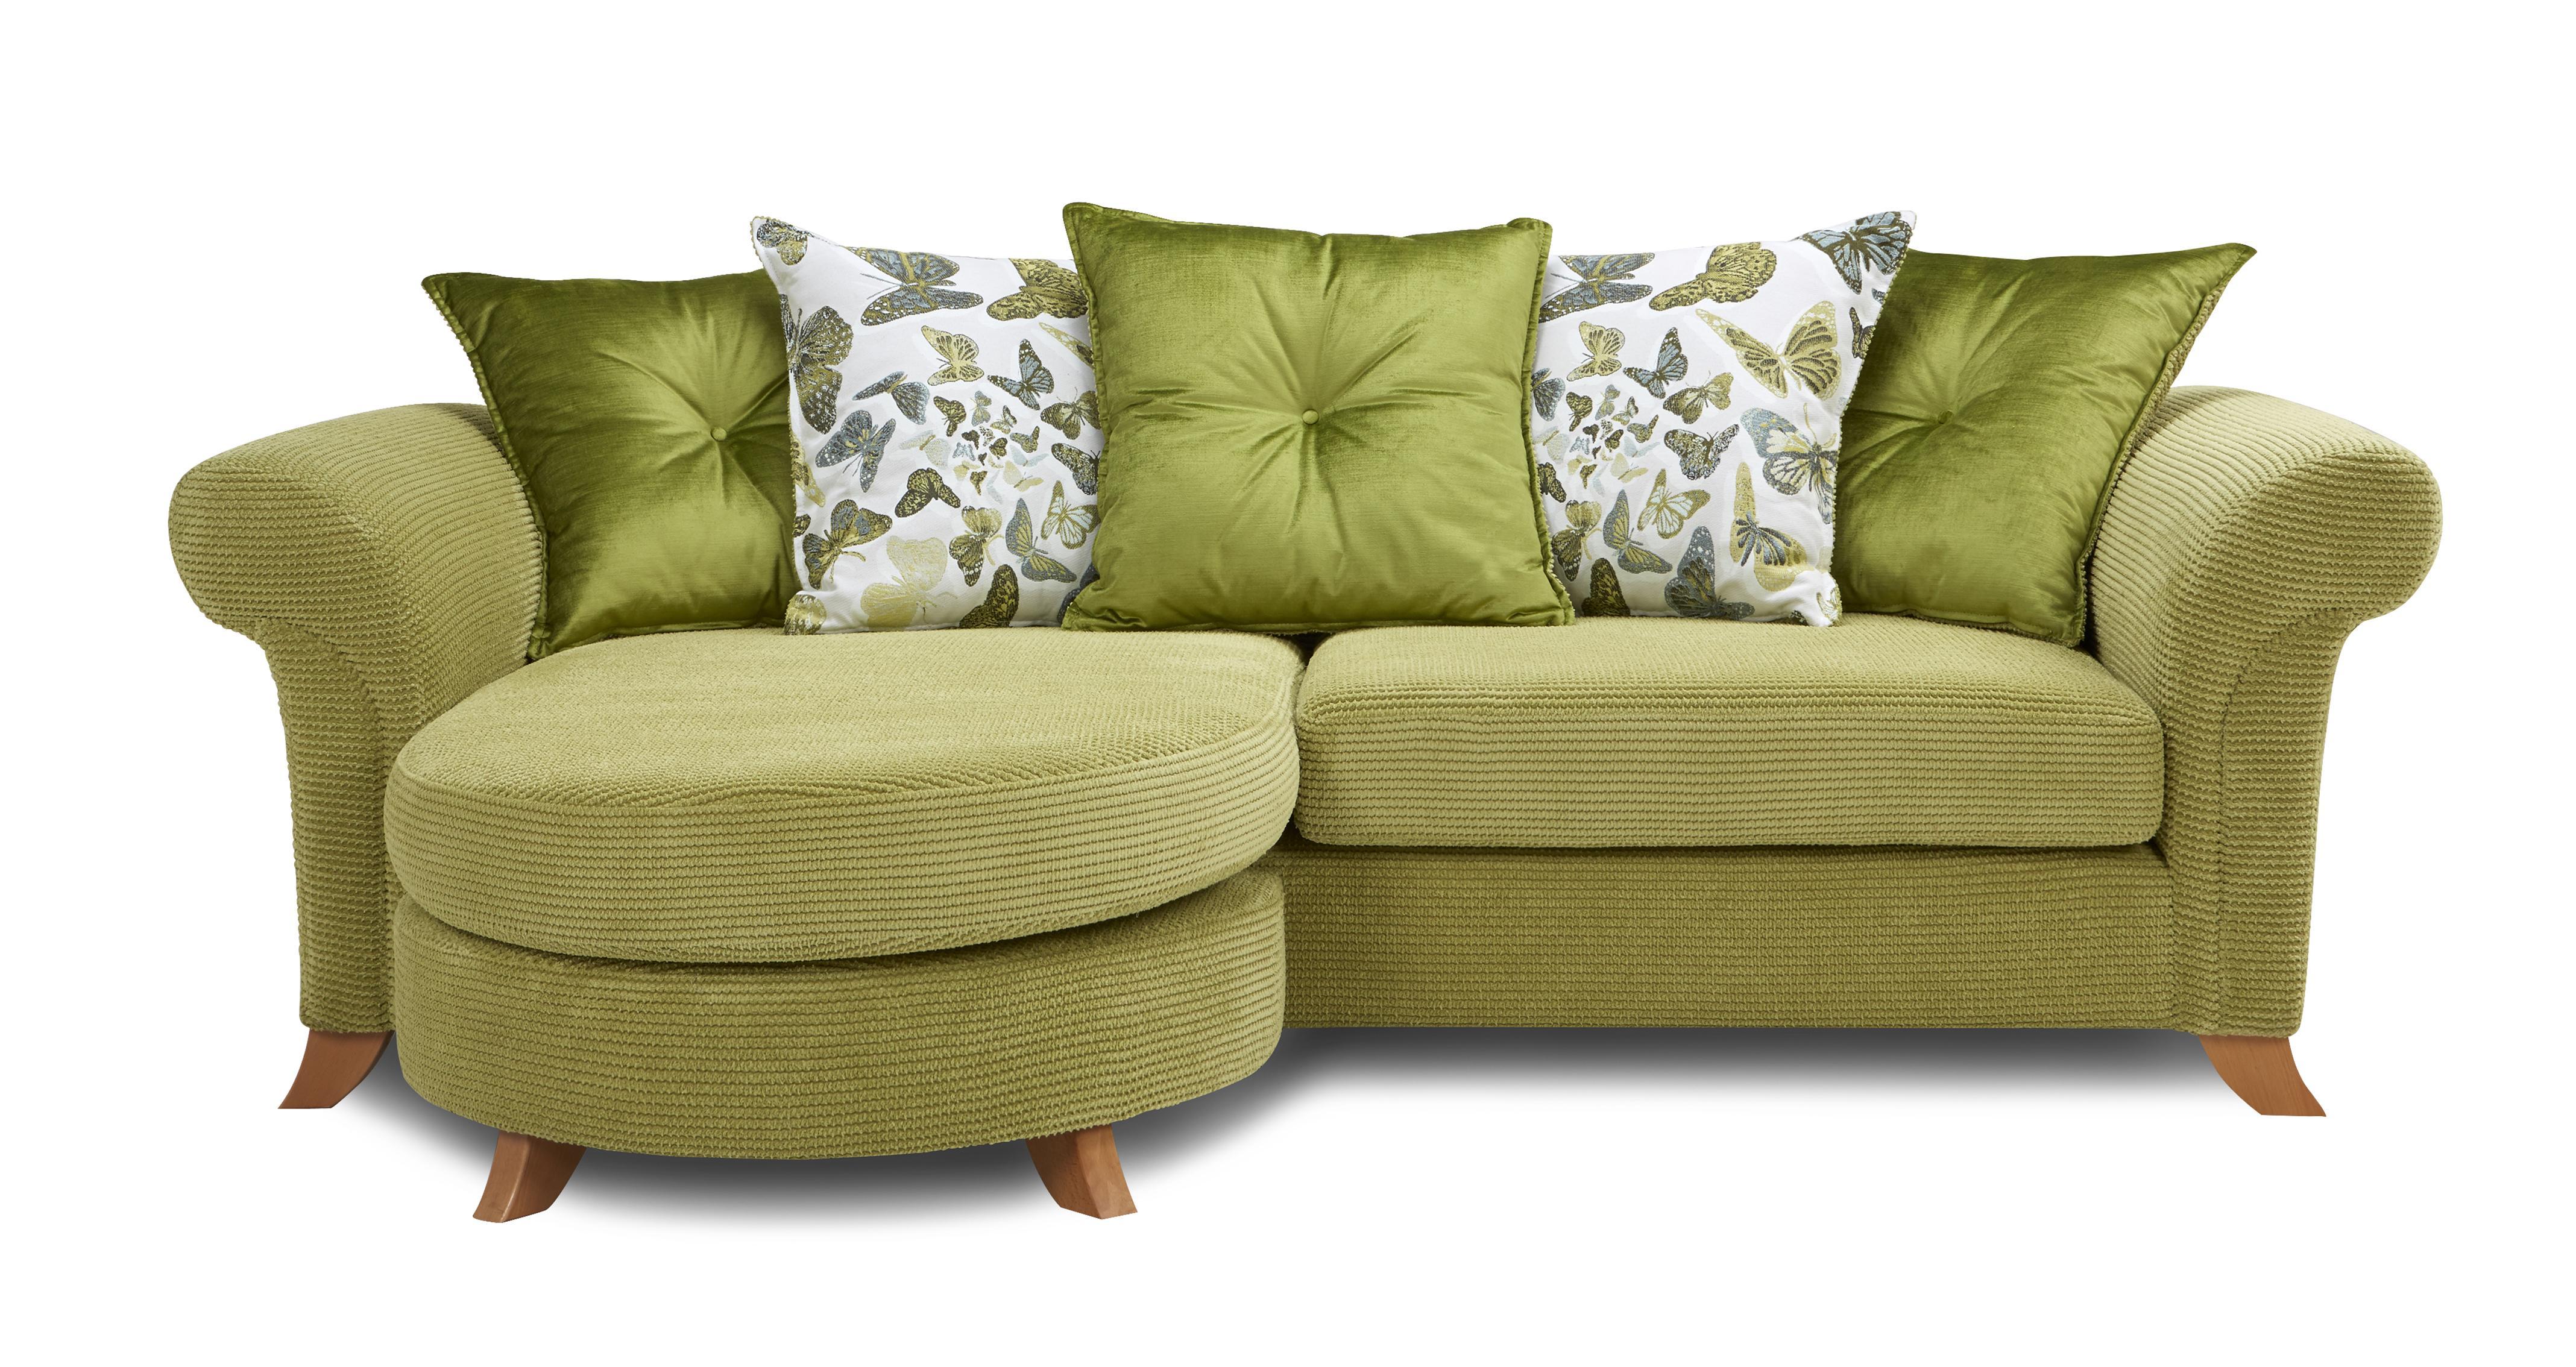 Delight 4 Seater Pillow Back Lounger Sofa Escape